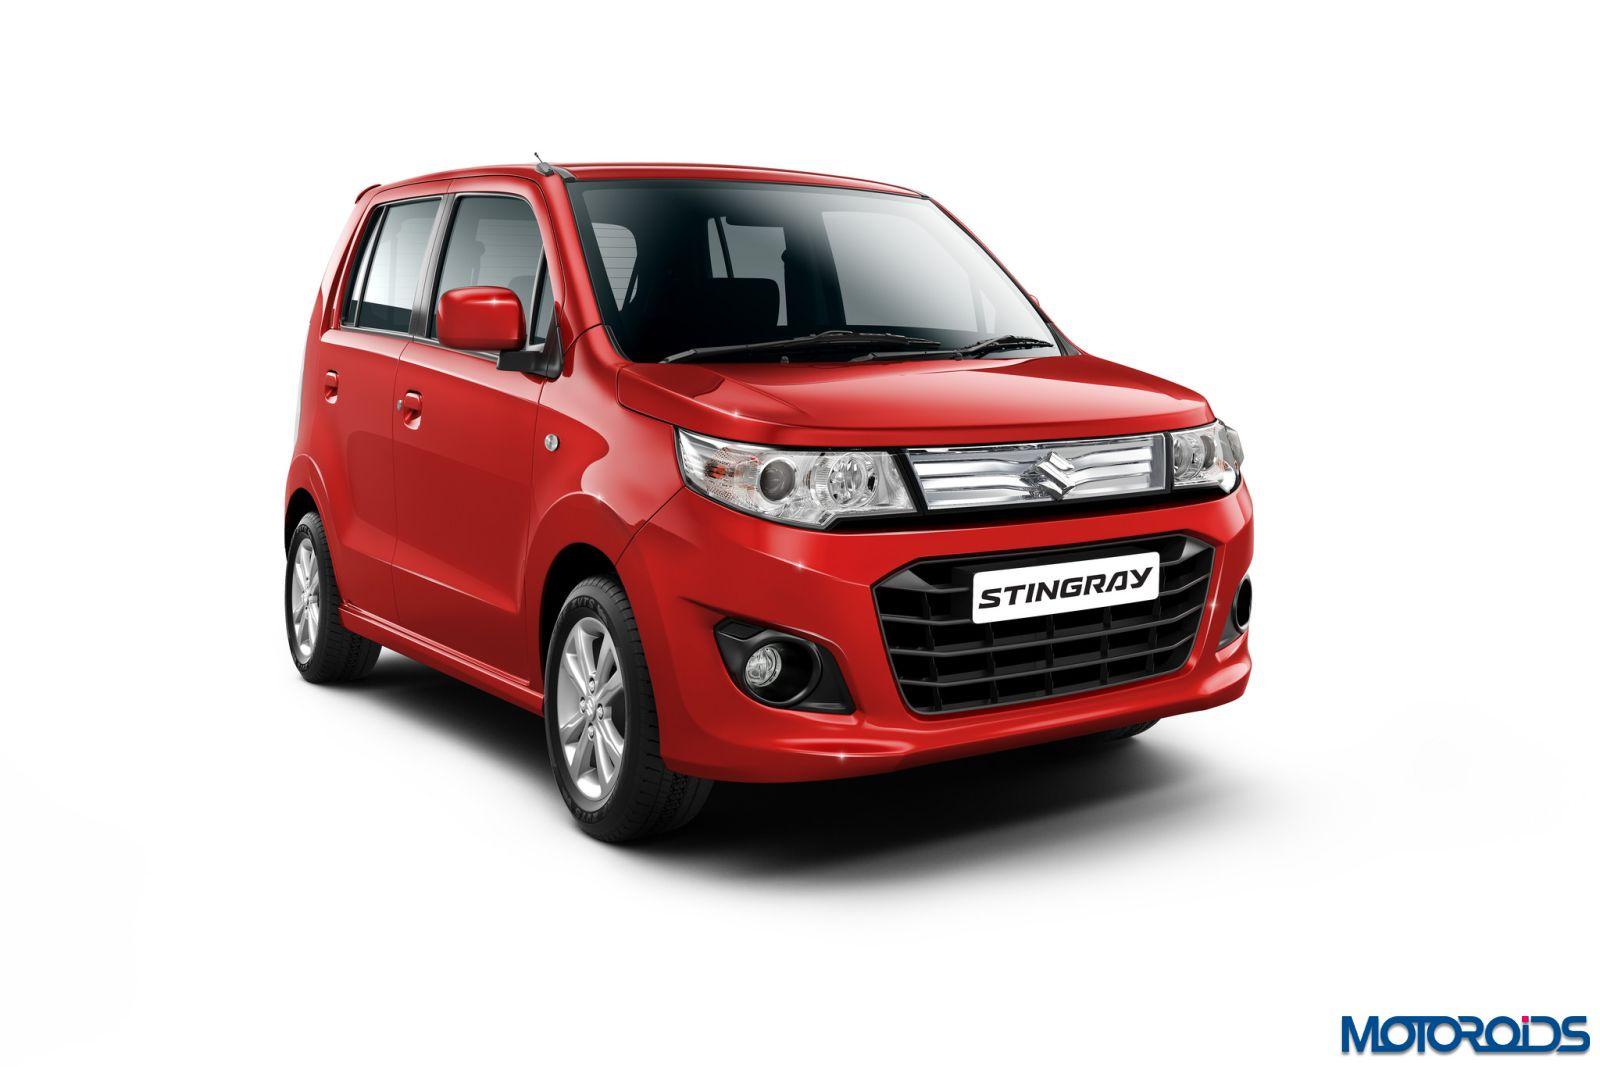 Maruti Suzuki WagonR and Stingray with Auto Gear Shift ...